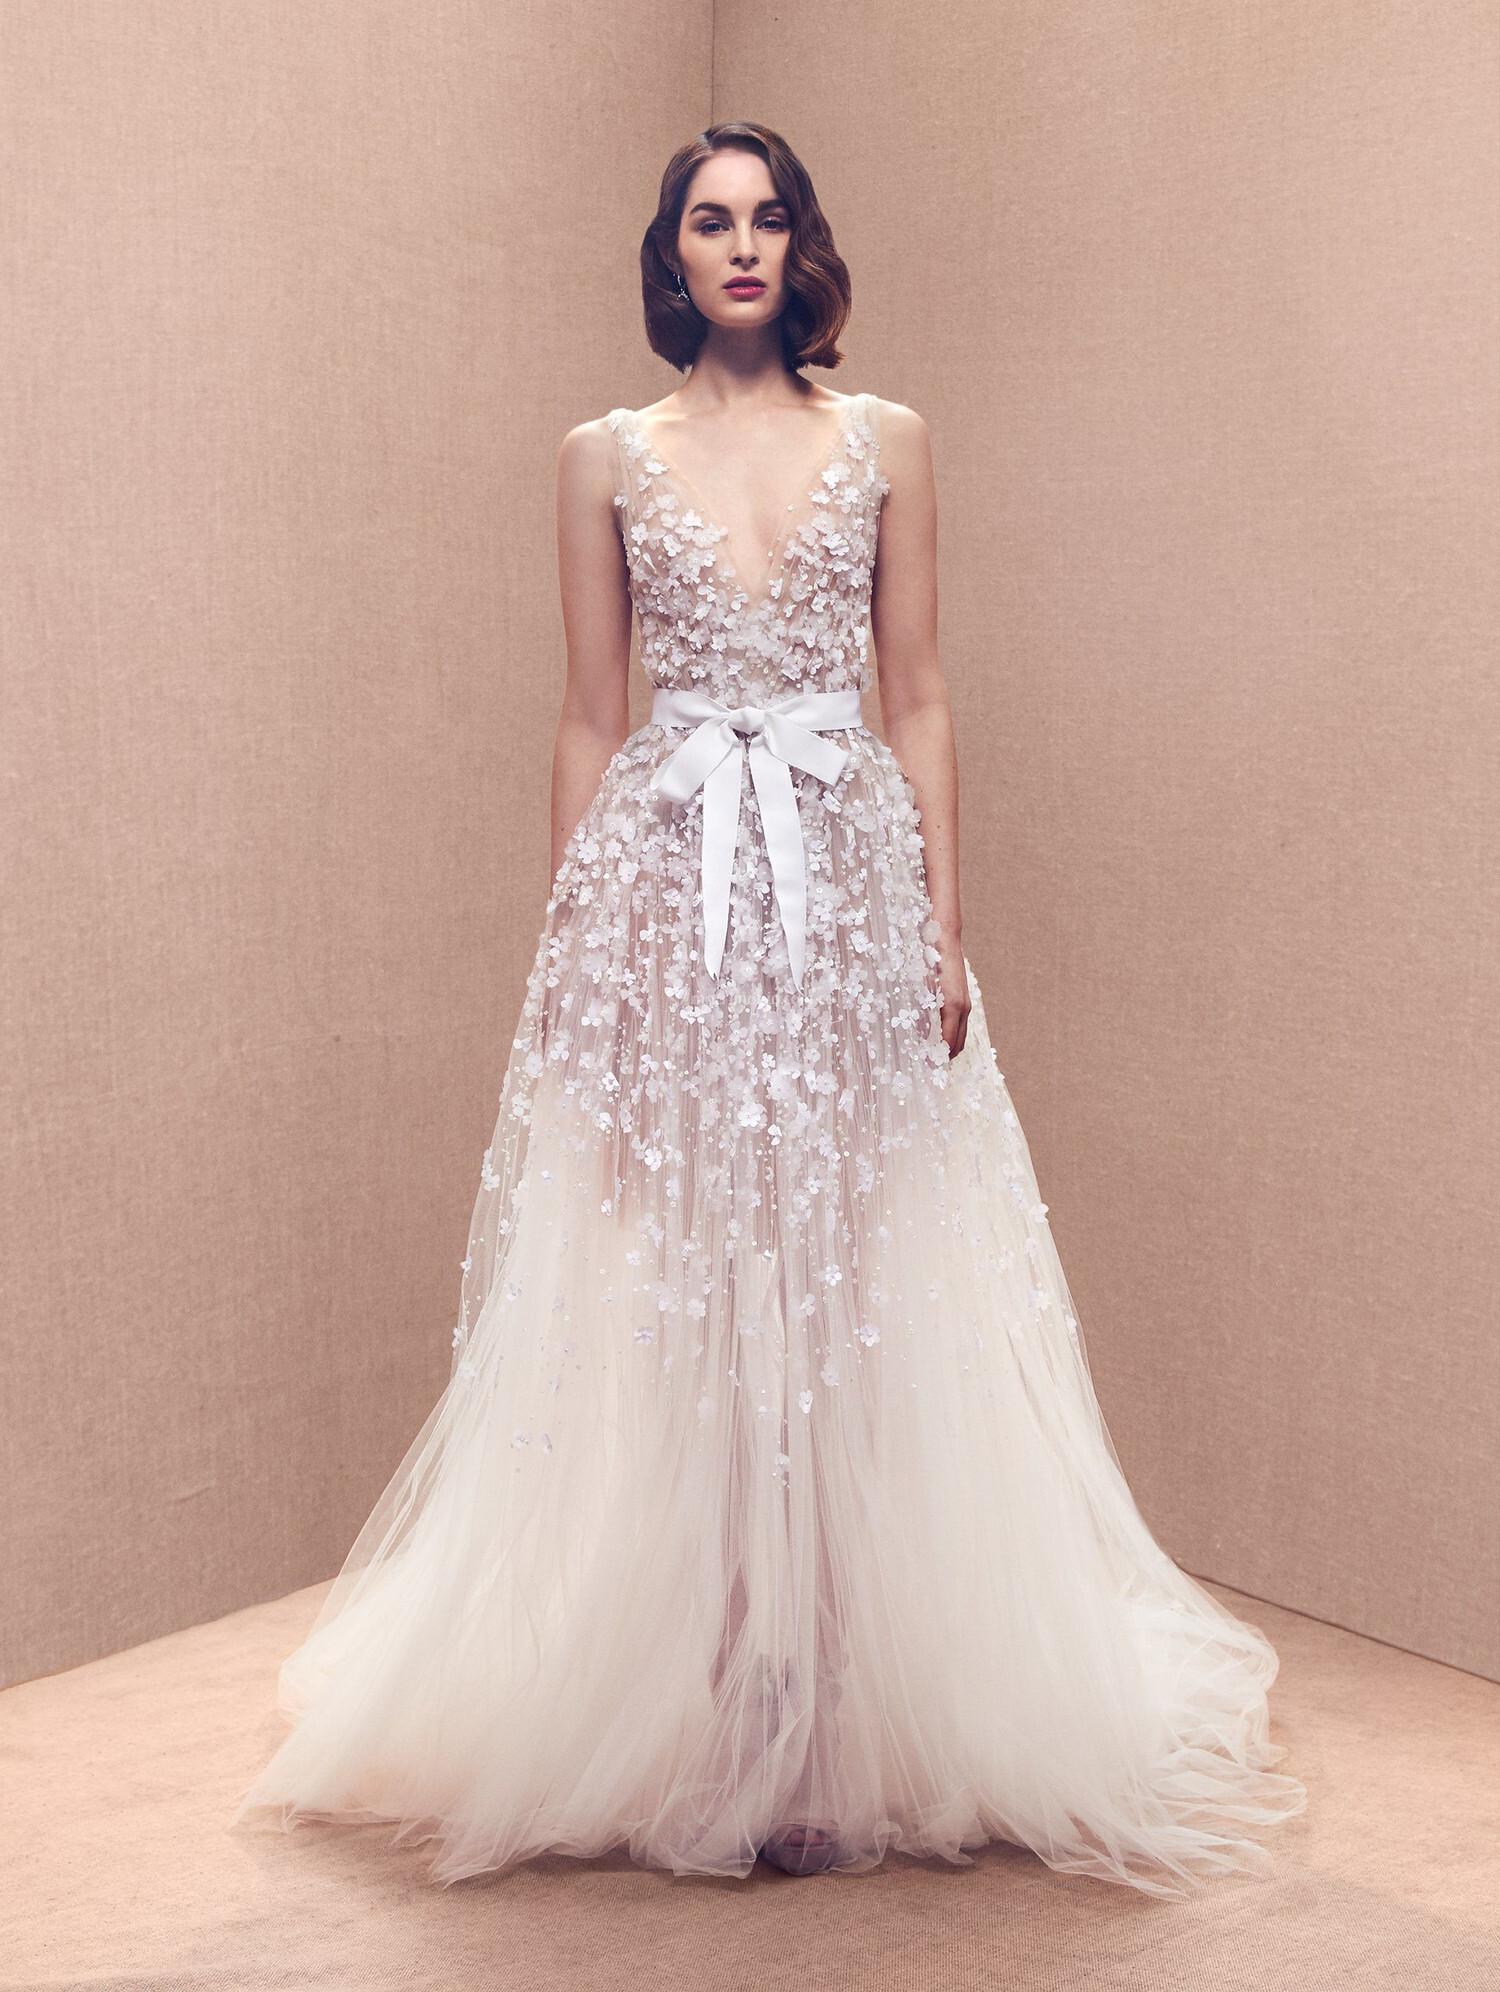 Vestidos de Novia de Oscar de la Renta - Matrimonio.com.co